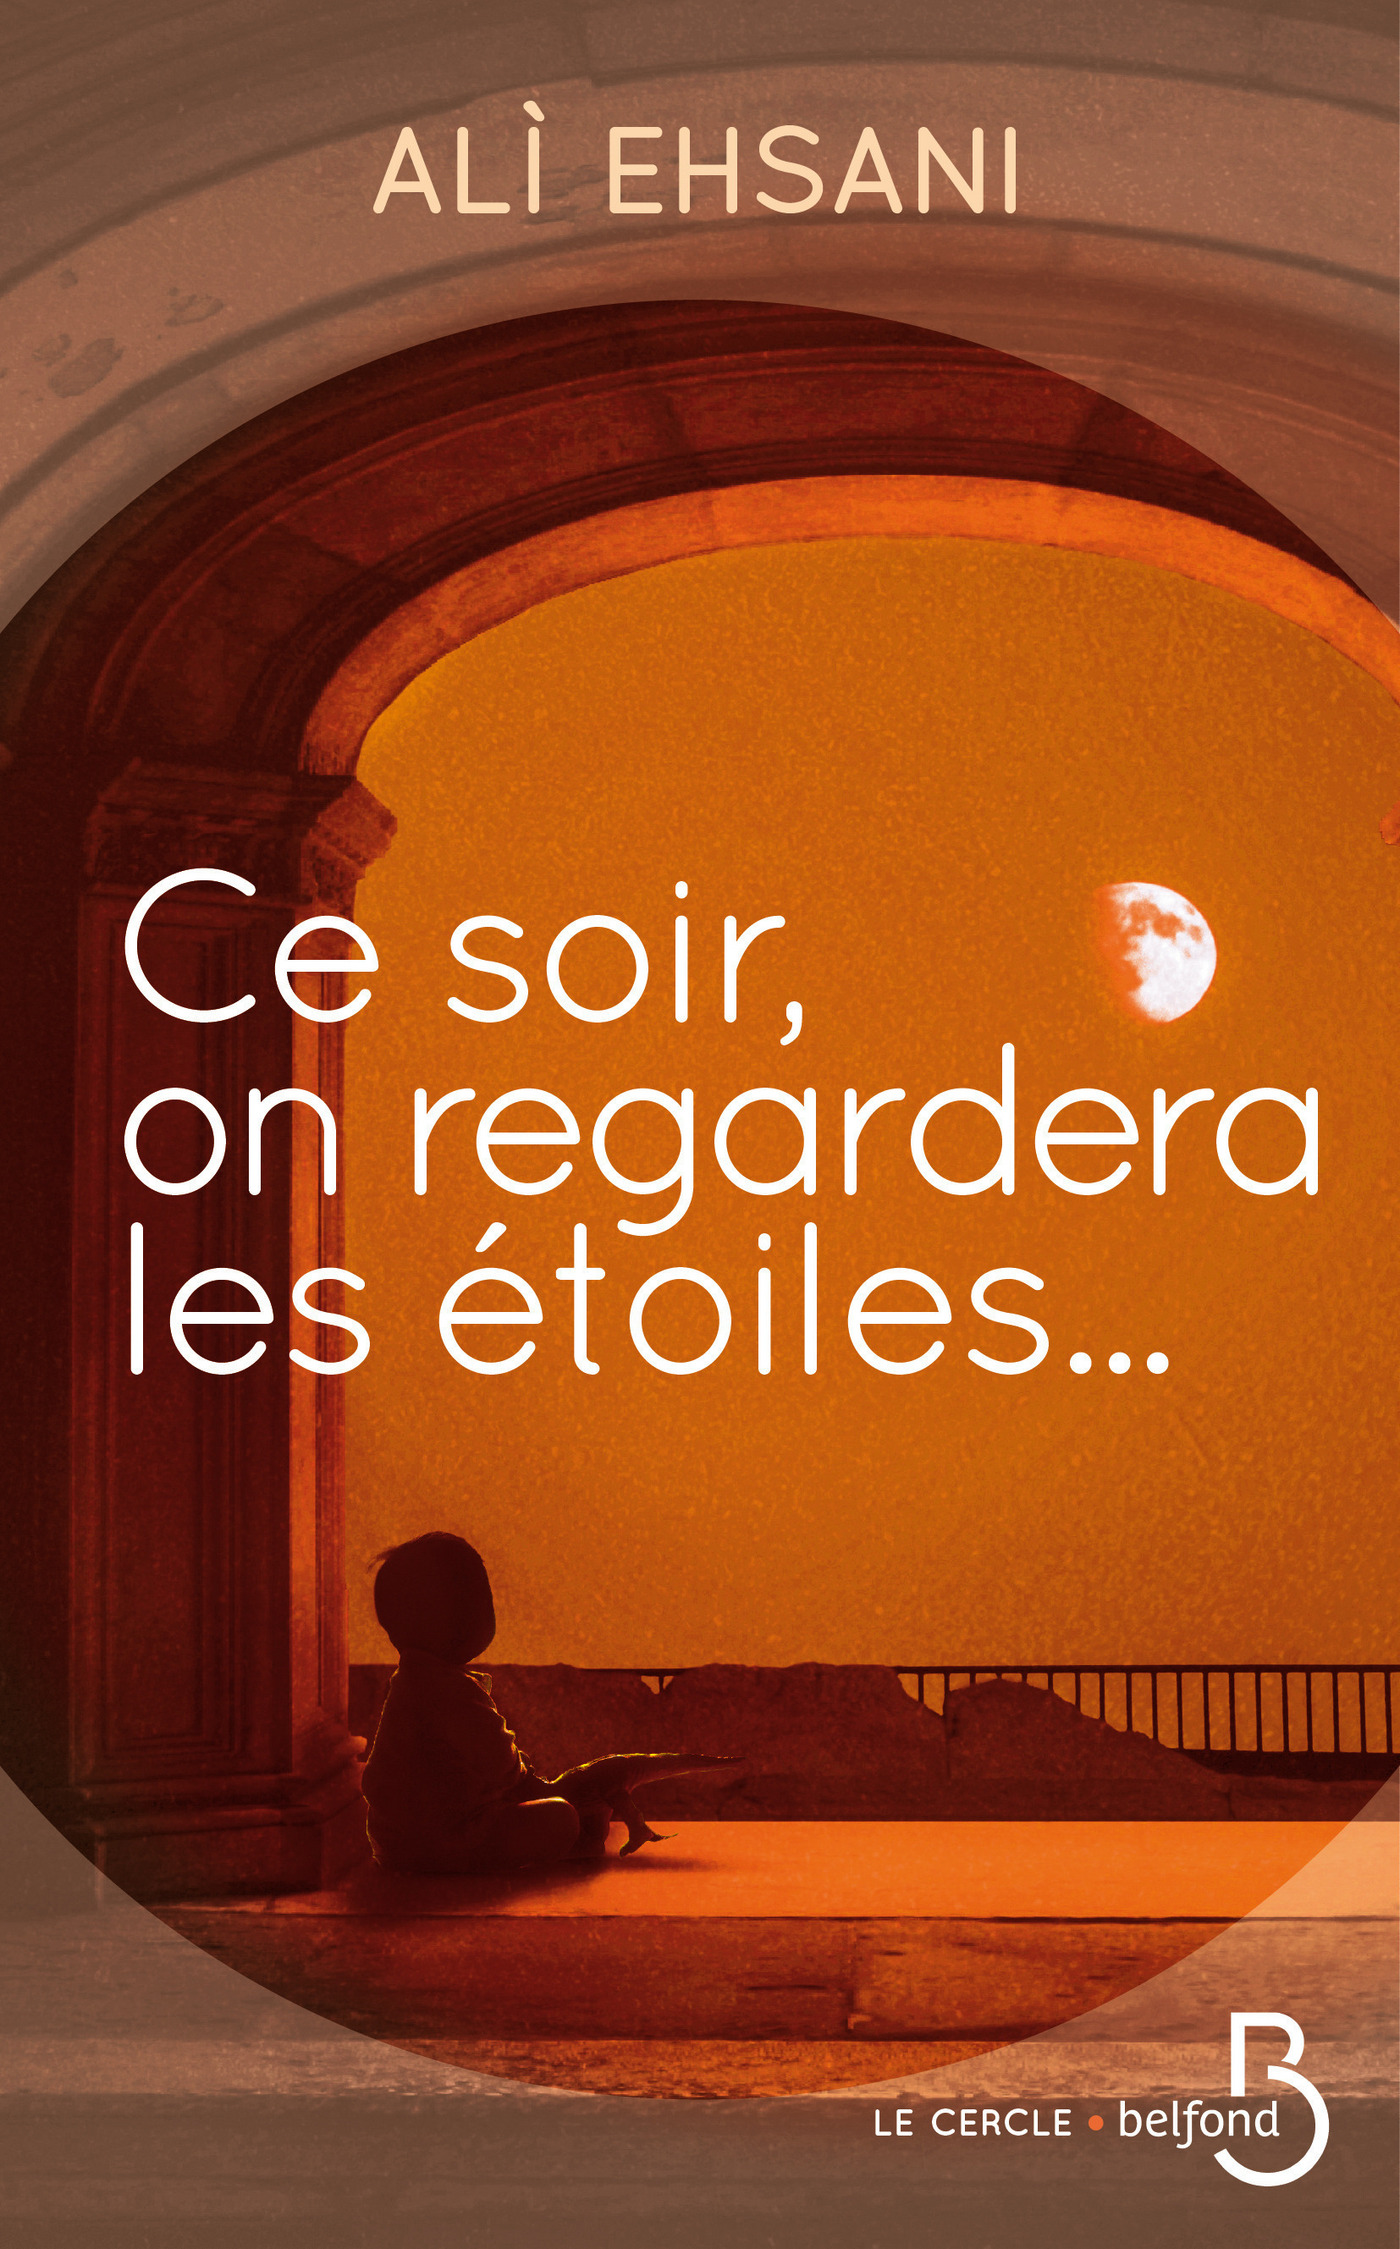 Ce soir, on regardera les étoiles...